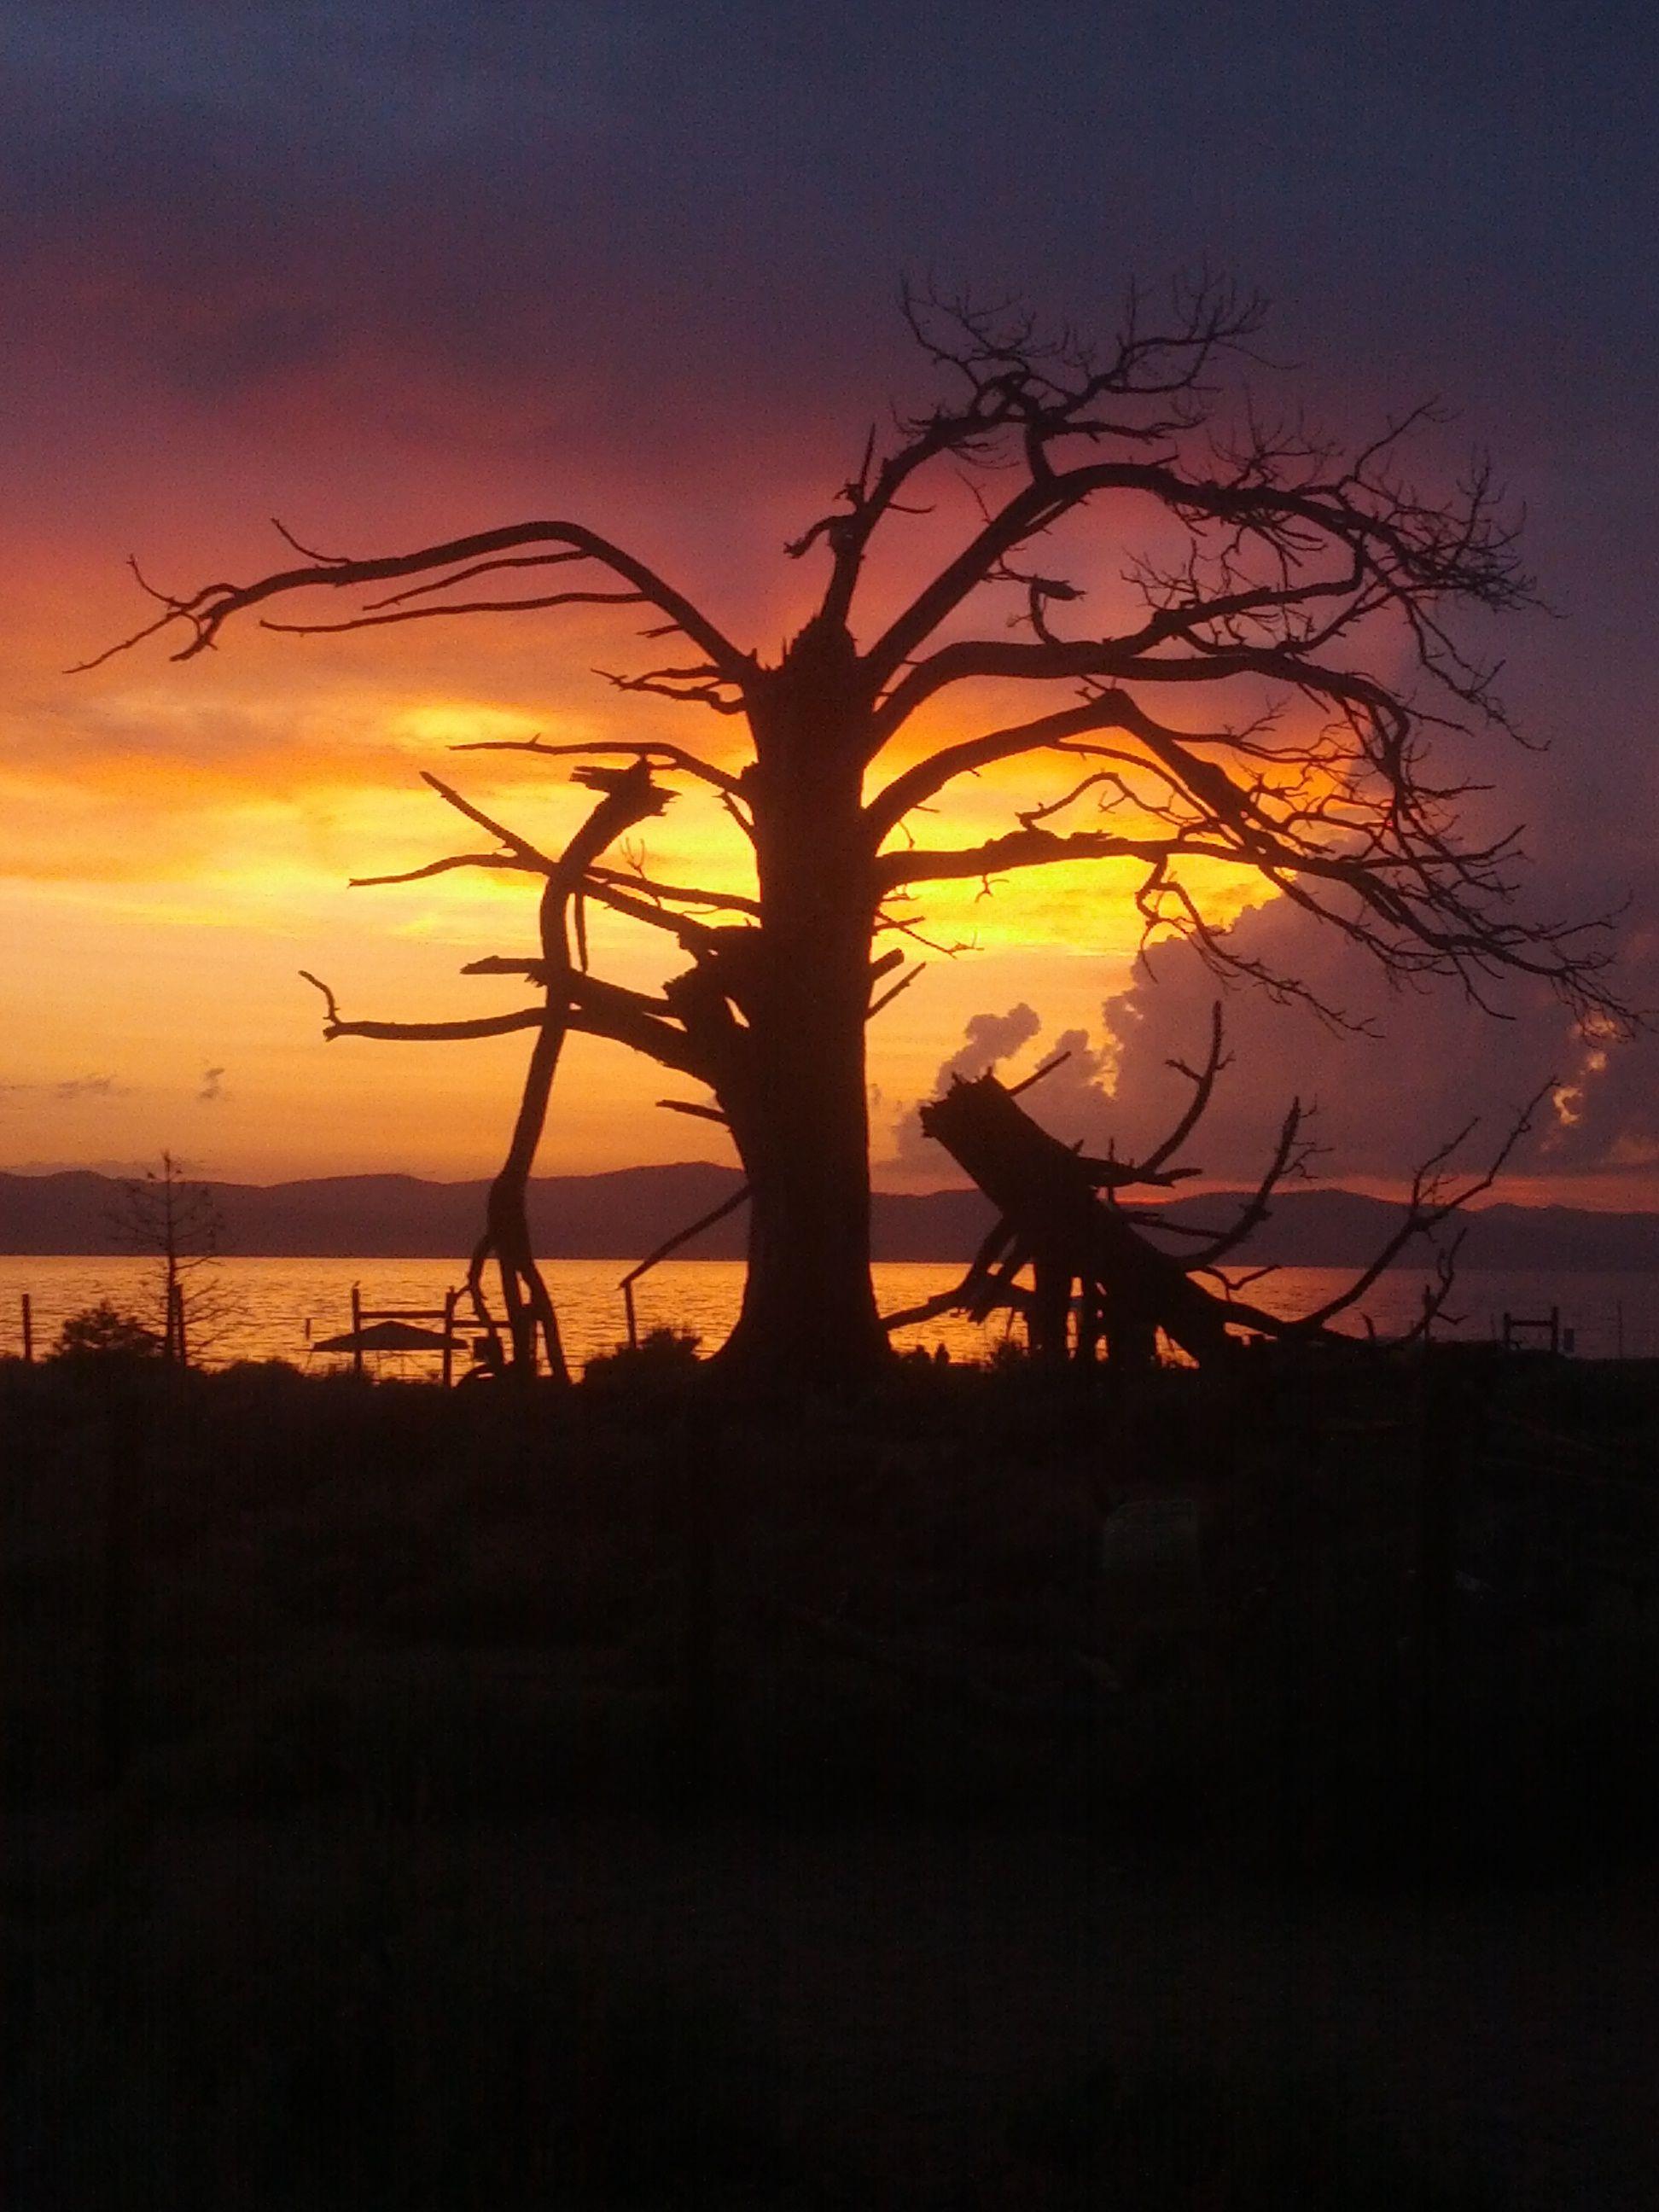 Lake tahoe sunset travel channel pinterest - Nevada Beach Parking Lotnevadaflatdogbeachessunsetlake Tahoeoff